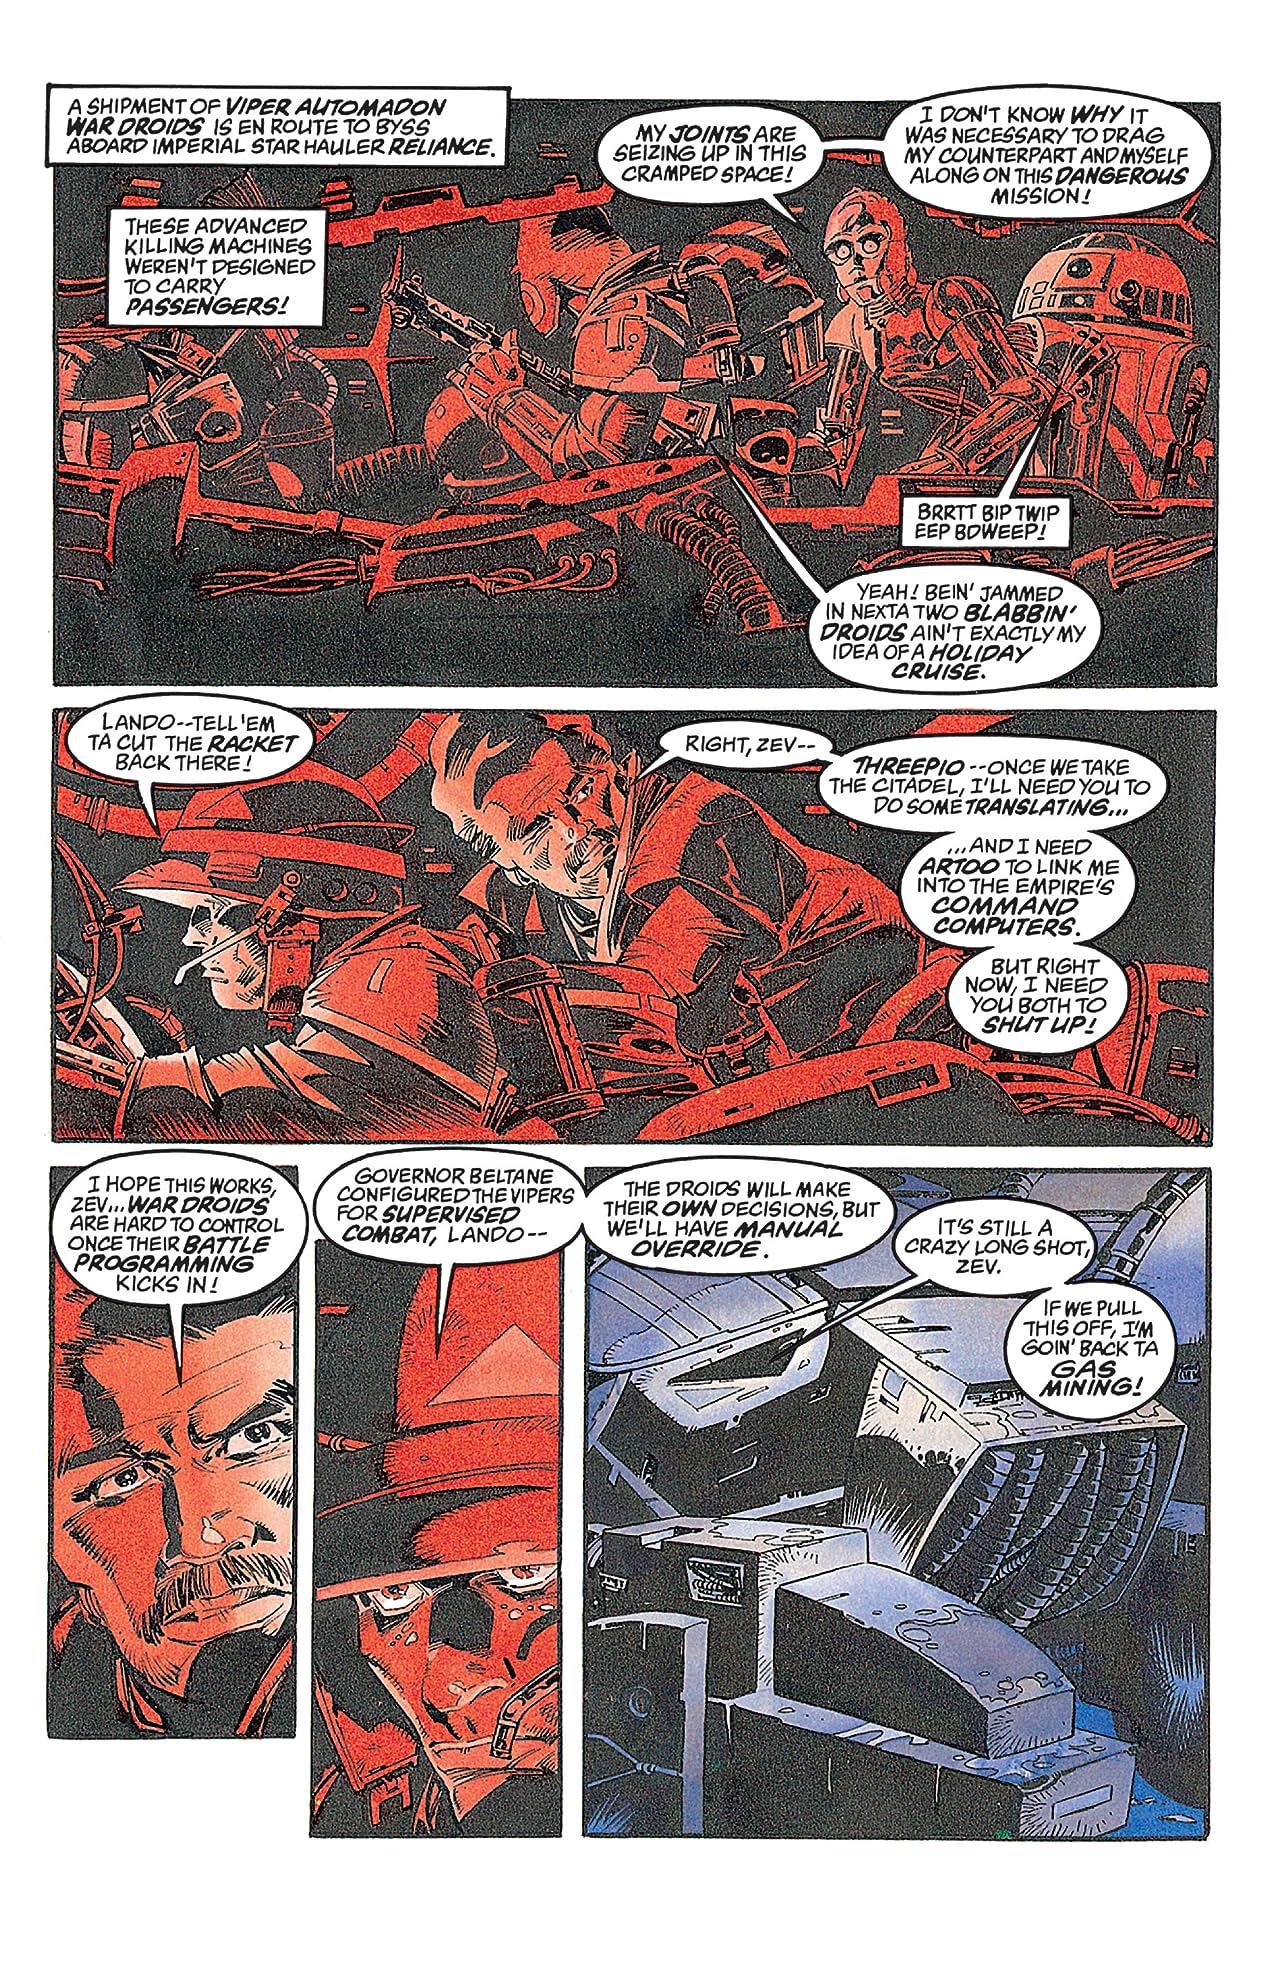 Star Wars: Dark Empire II (1994-1995) #4 (of 6)